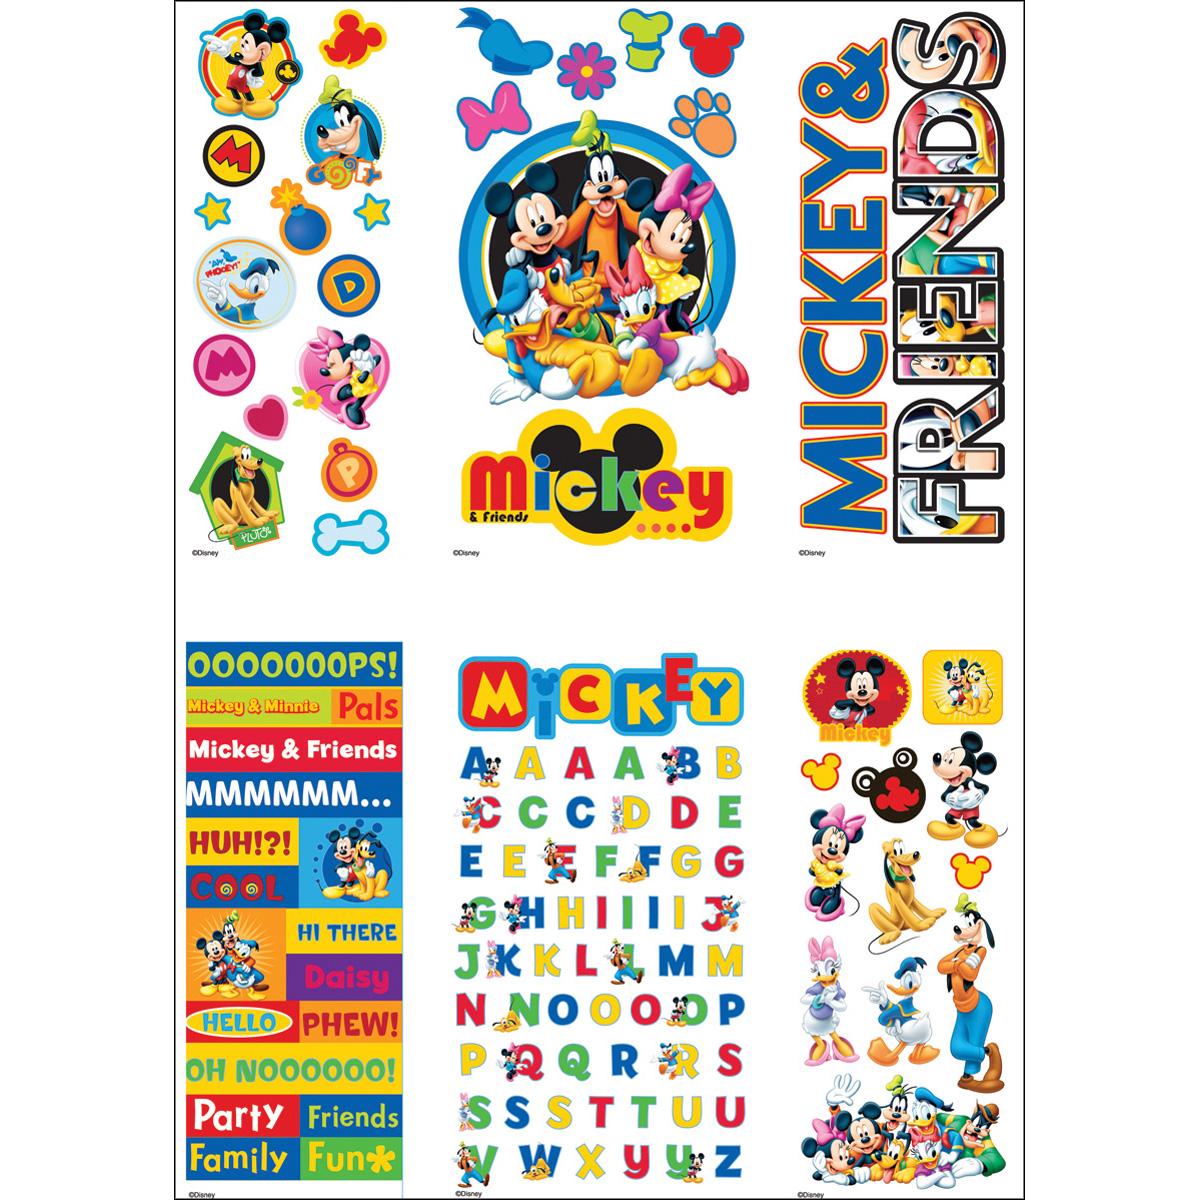 Disney Value Sticker Set W/6 Sheets-Mickey & Friends; (4) 3D & (2) Flat